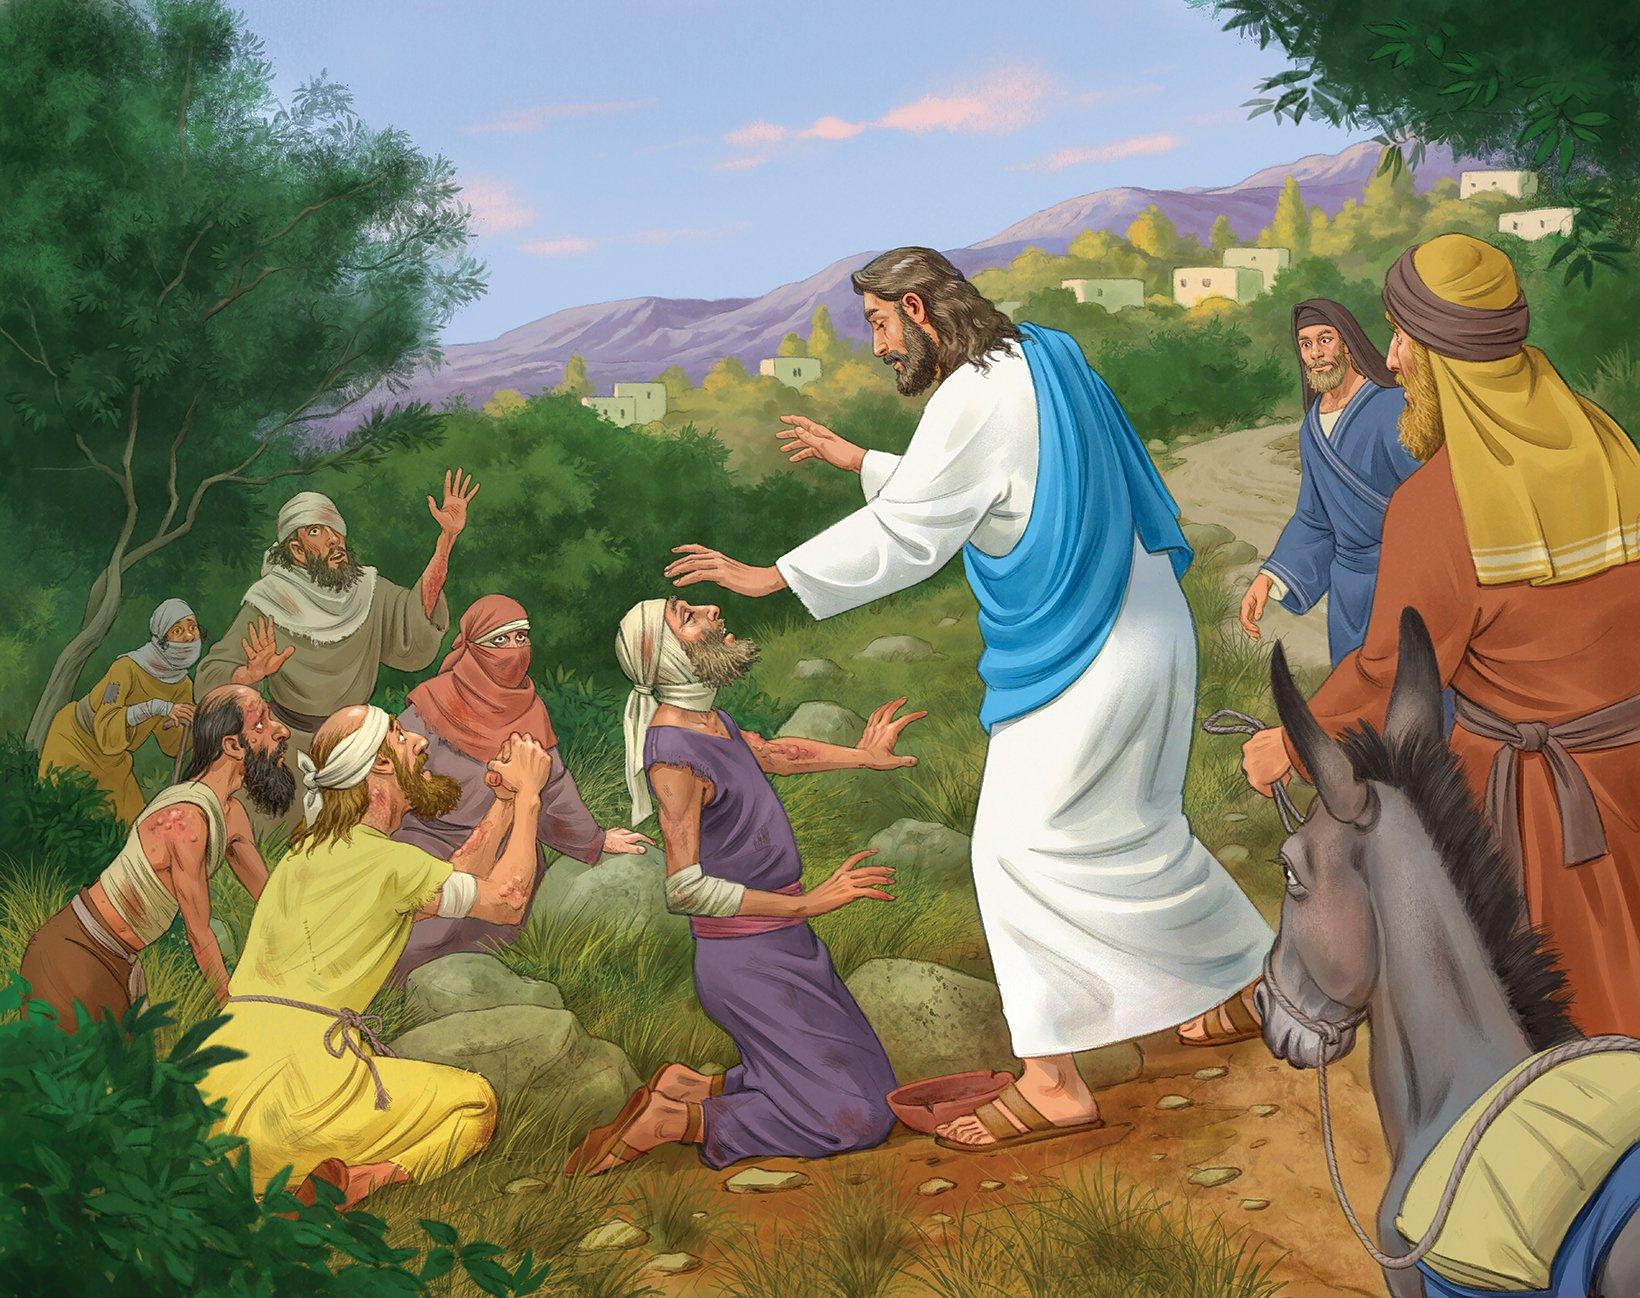 Bible Lesson 4 - Jesus the Savior is Risen